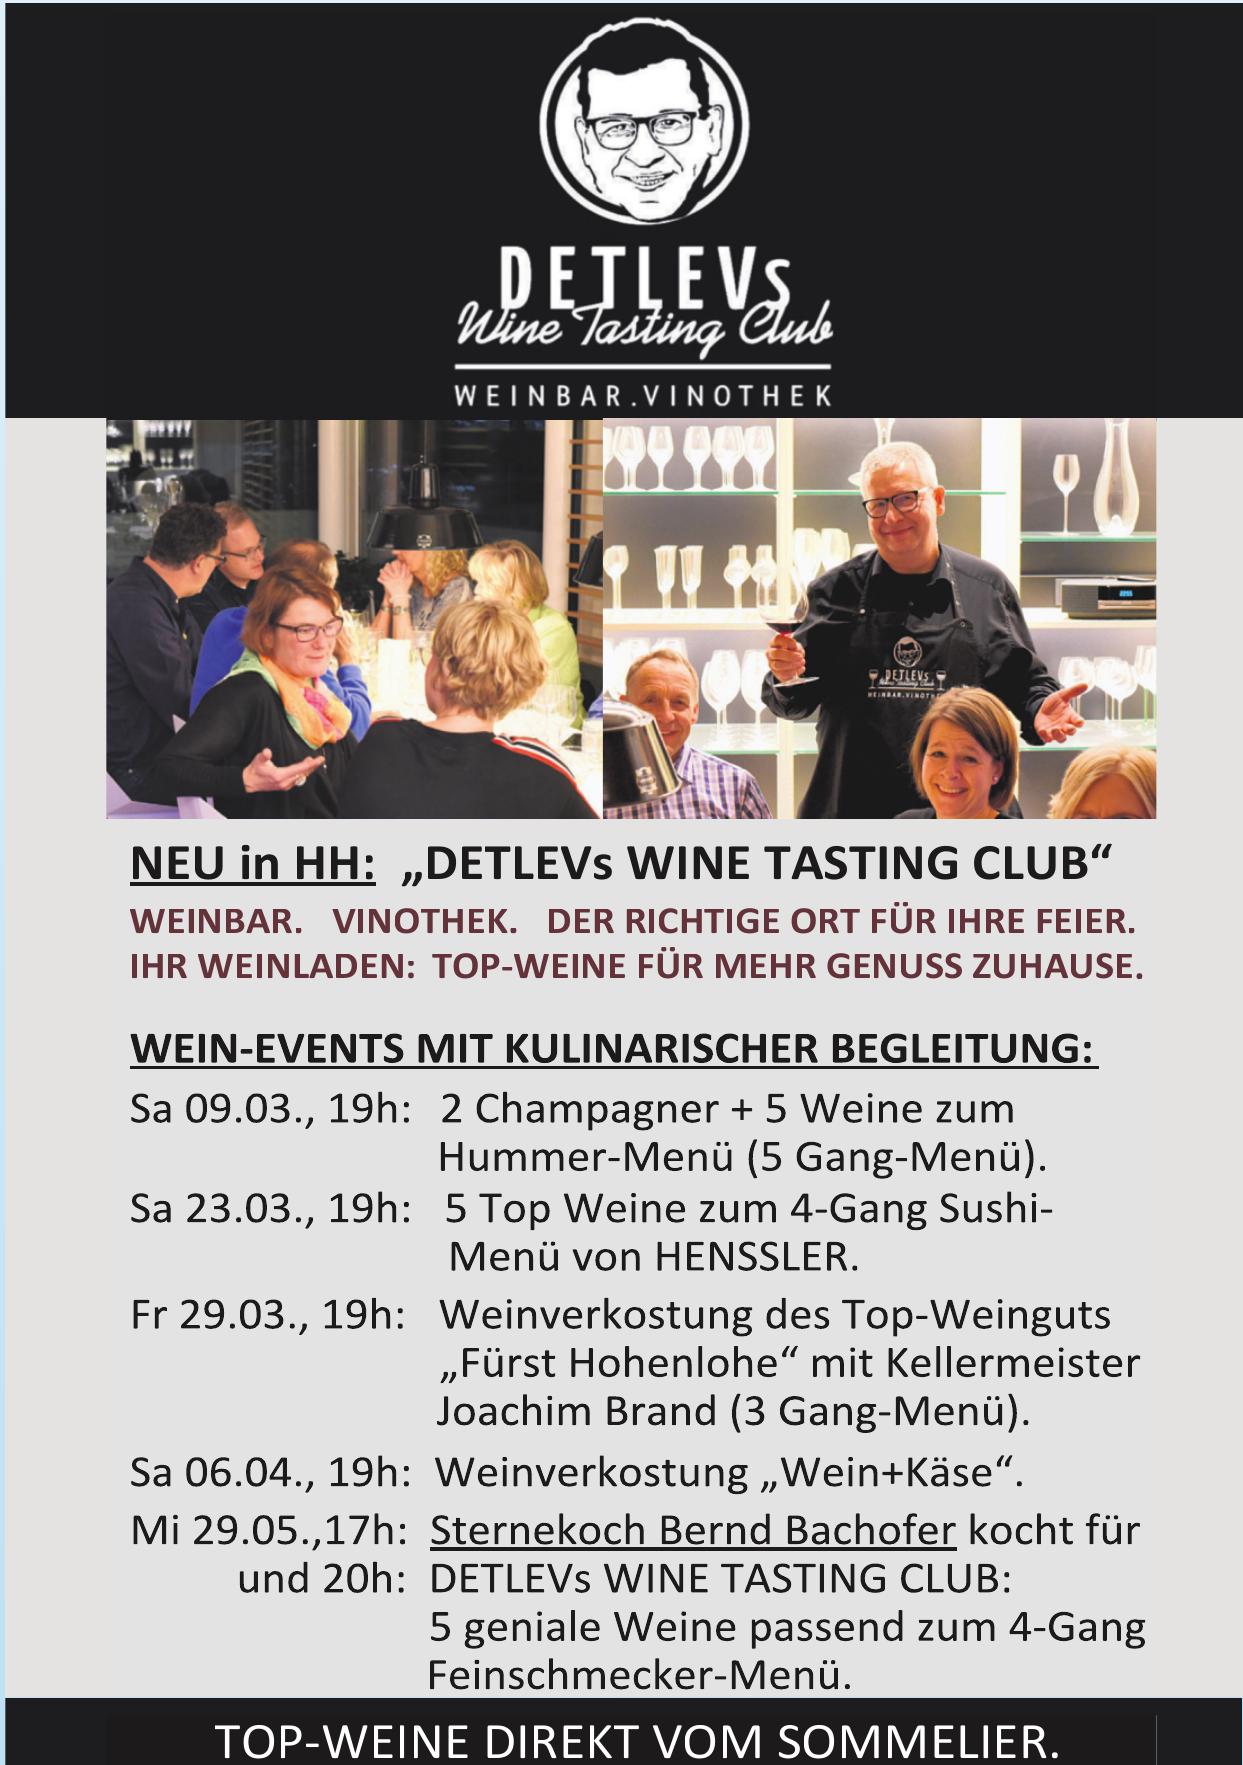 Detlevs Wine Tasting Club